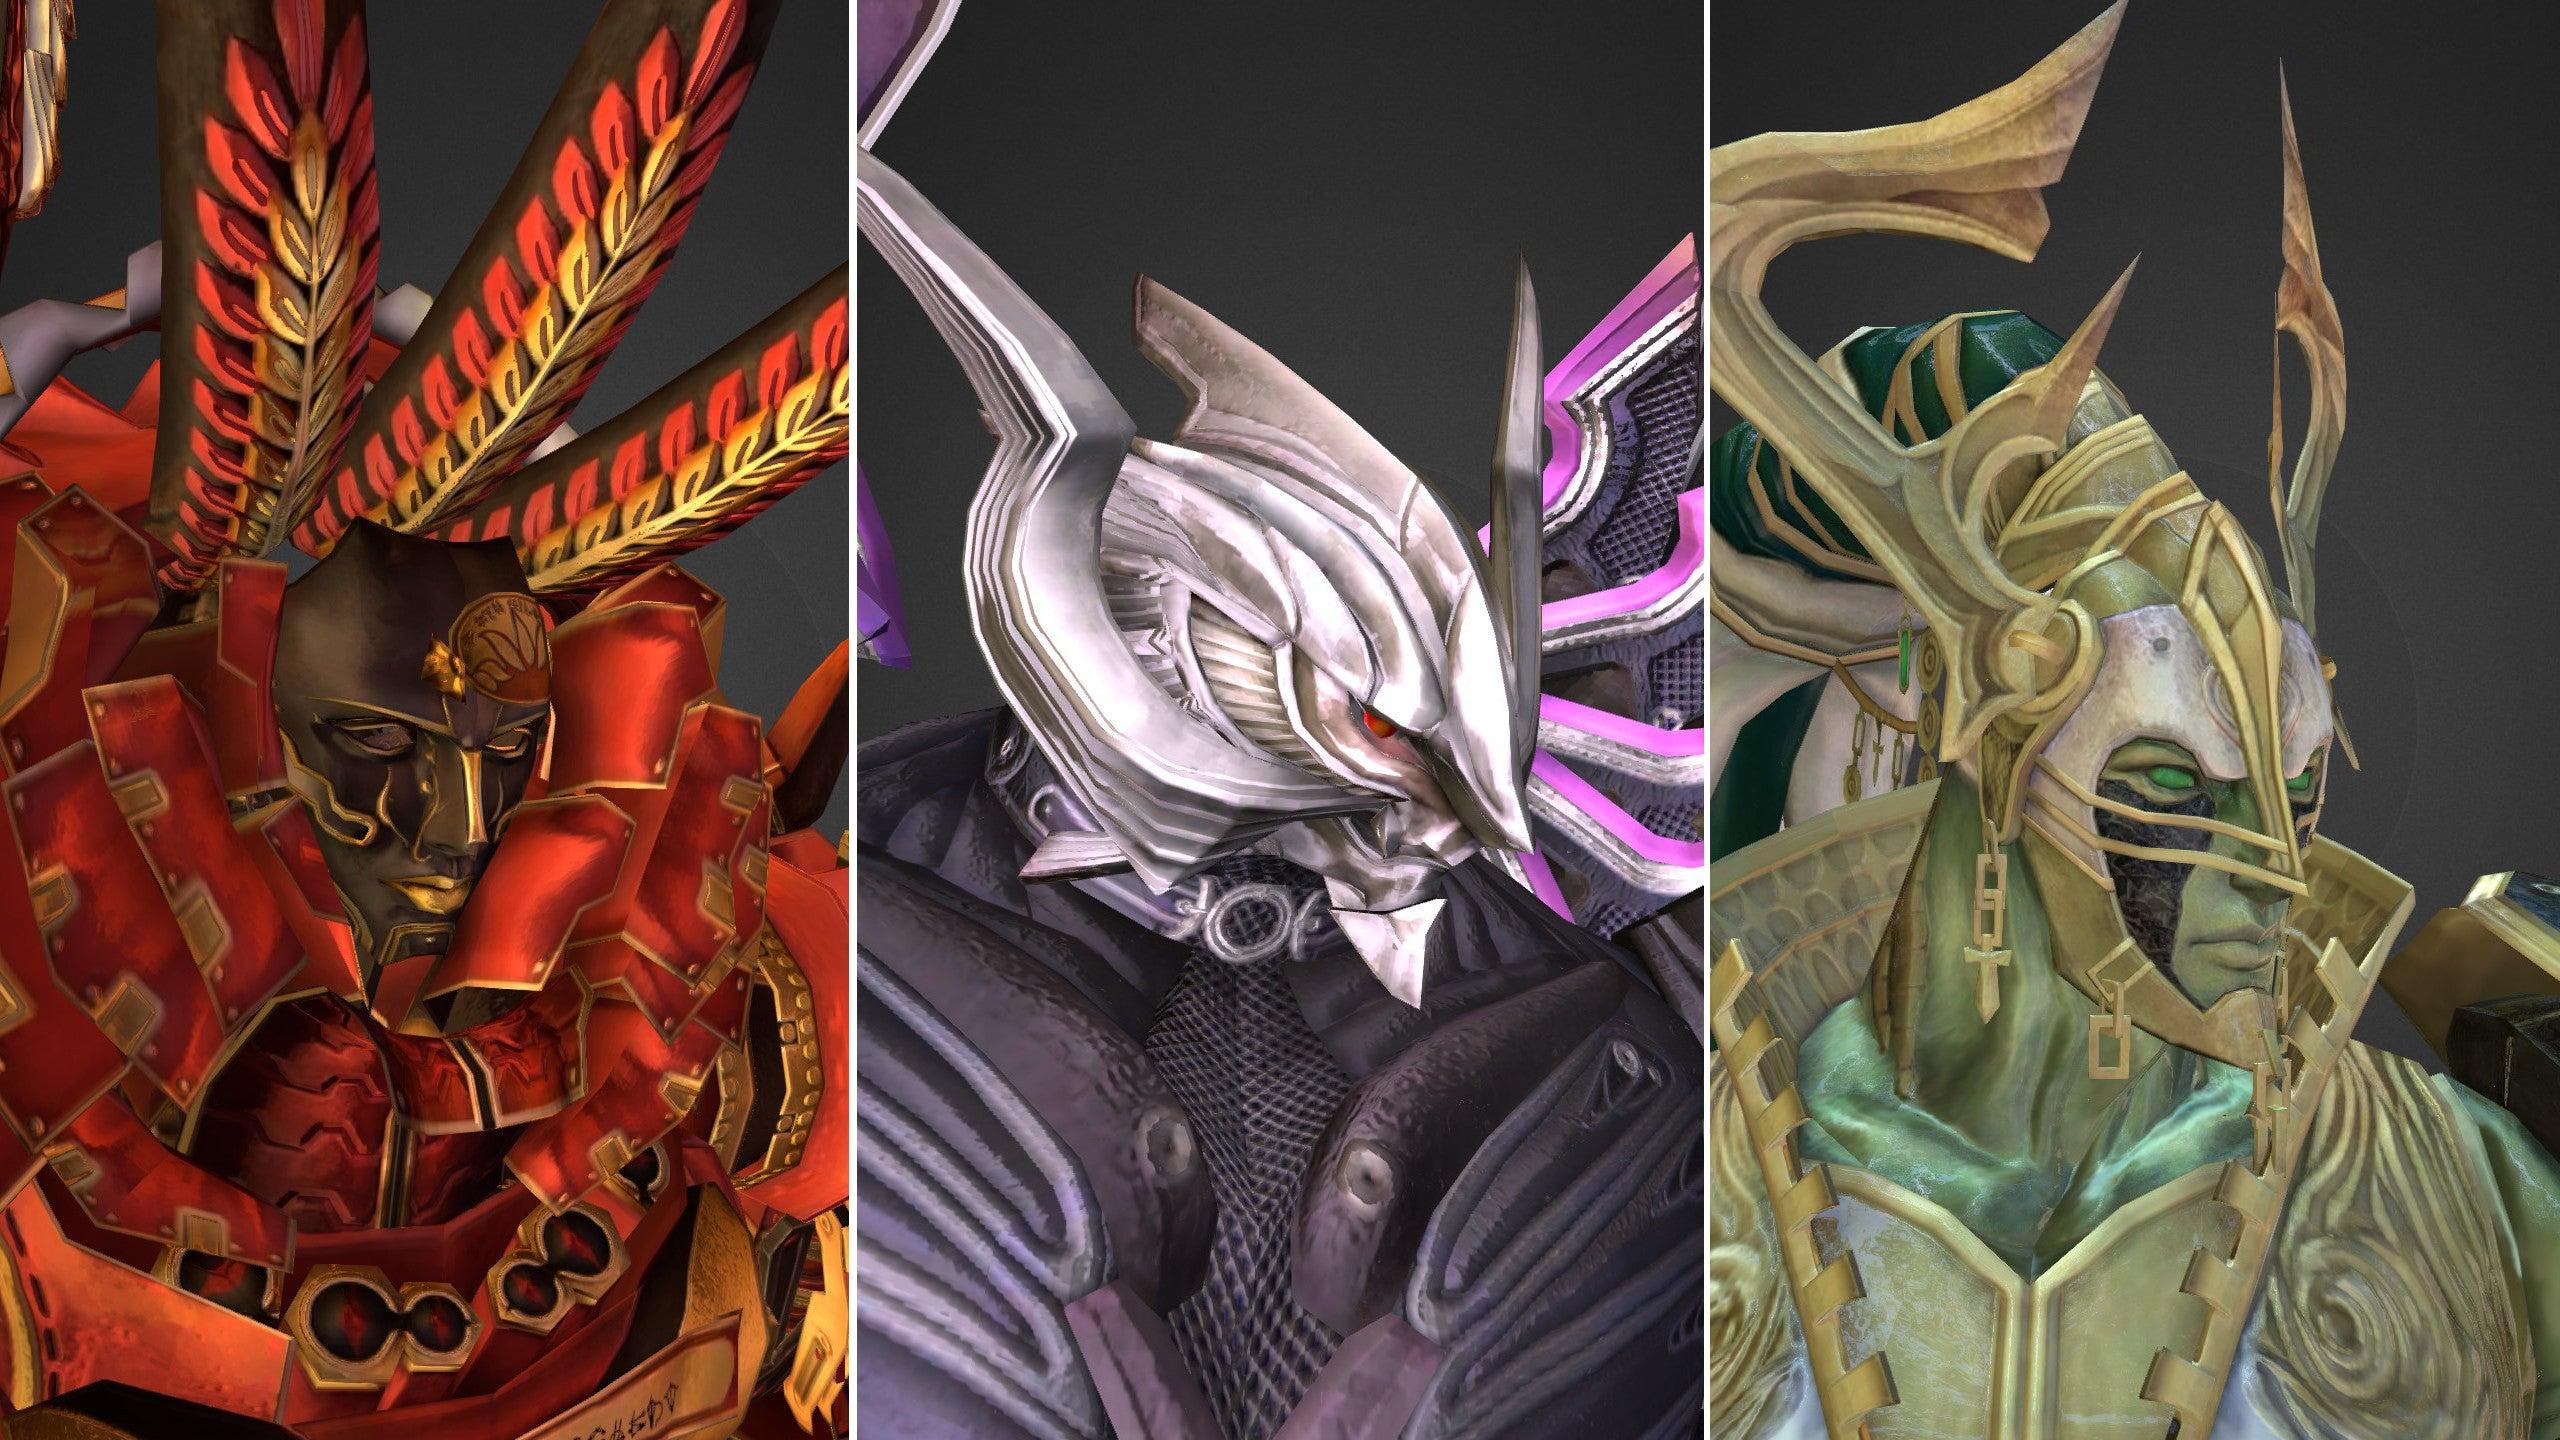 Final Fantasy Bosses Make For Great 3D Fanart